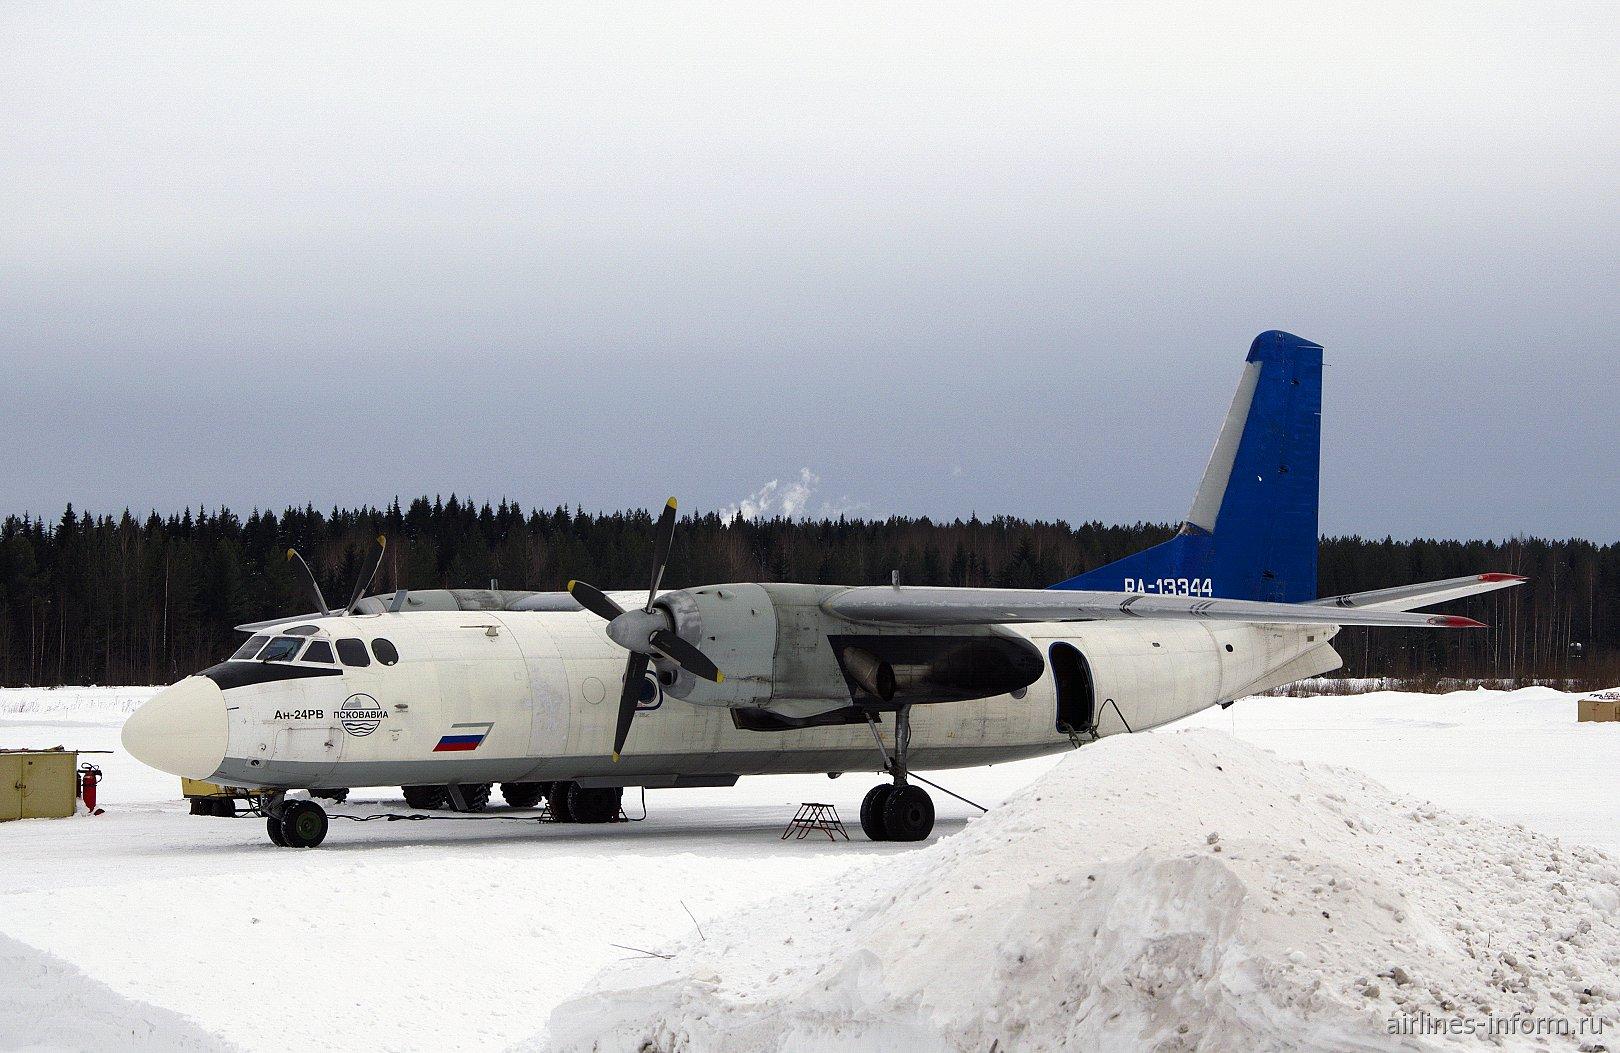 Самолет Ан-24 RA-13344 в аэропорту Котлас